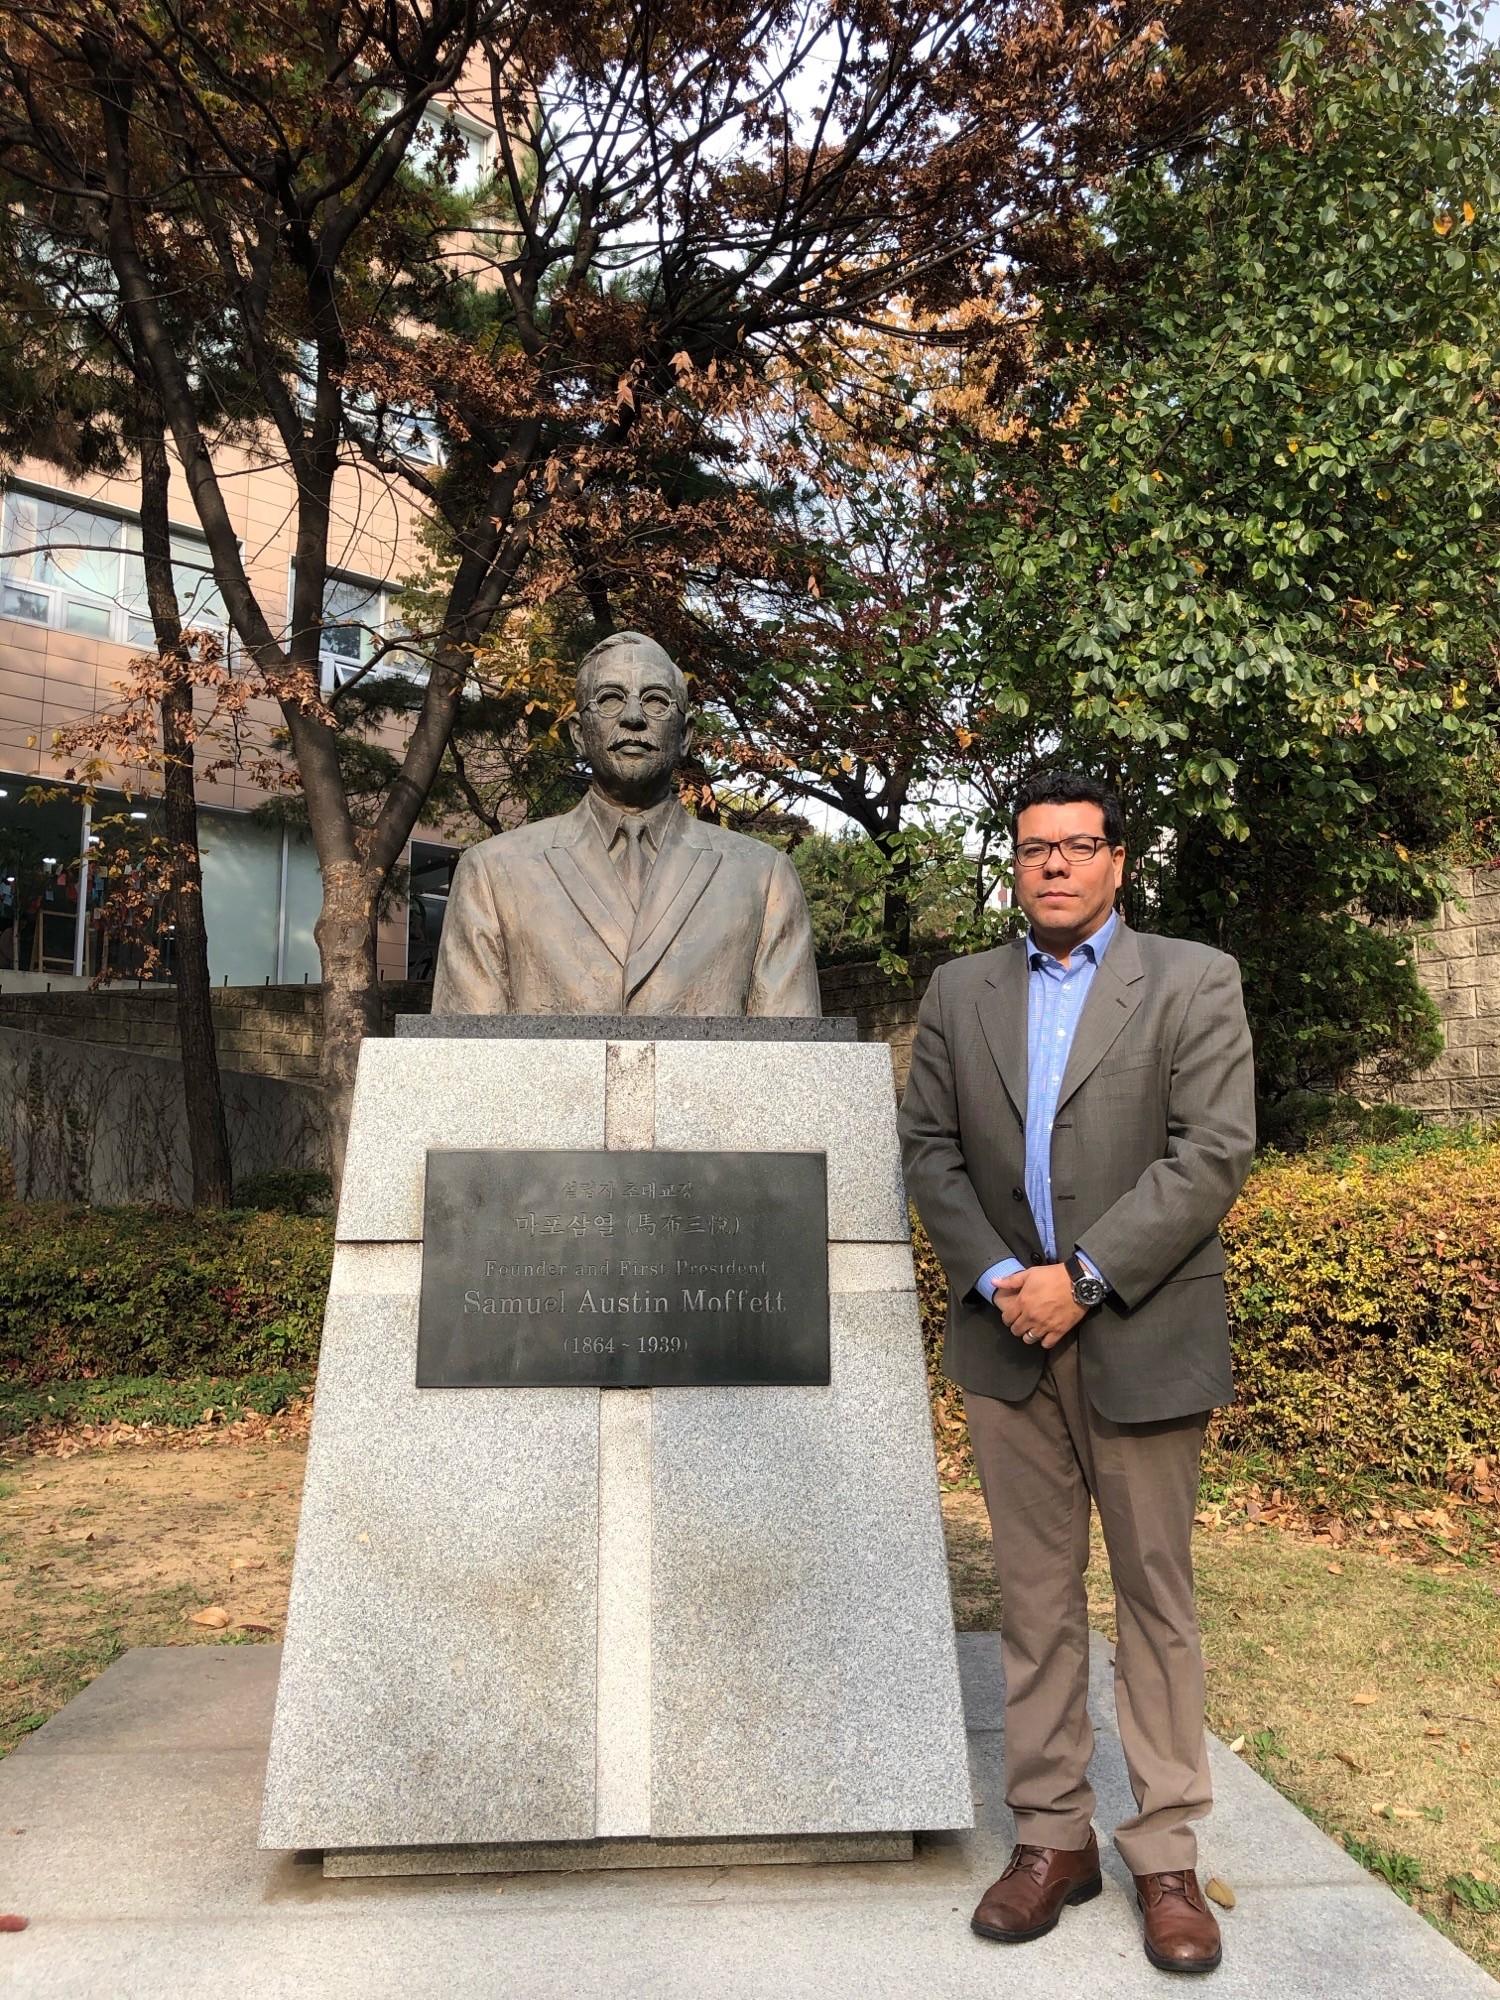 Grave of Samuel A. Moffett, celebrated Presbyterian Missionary to Korea